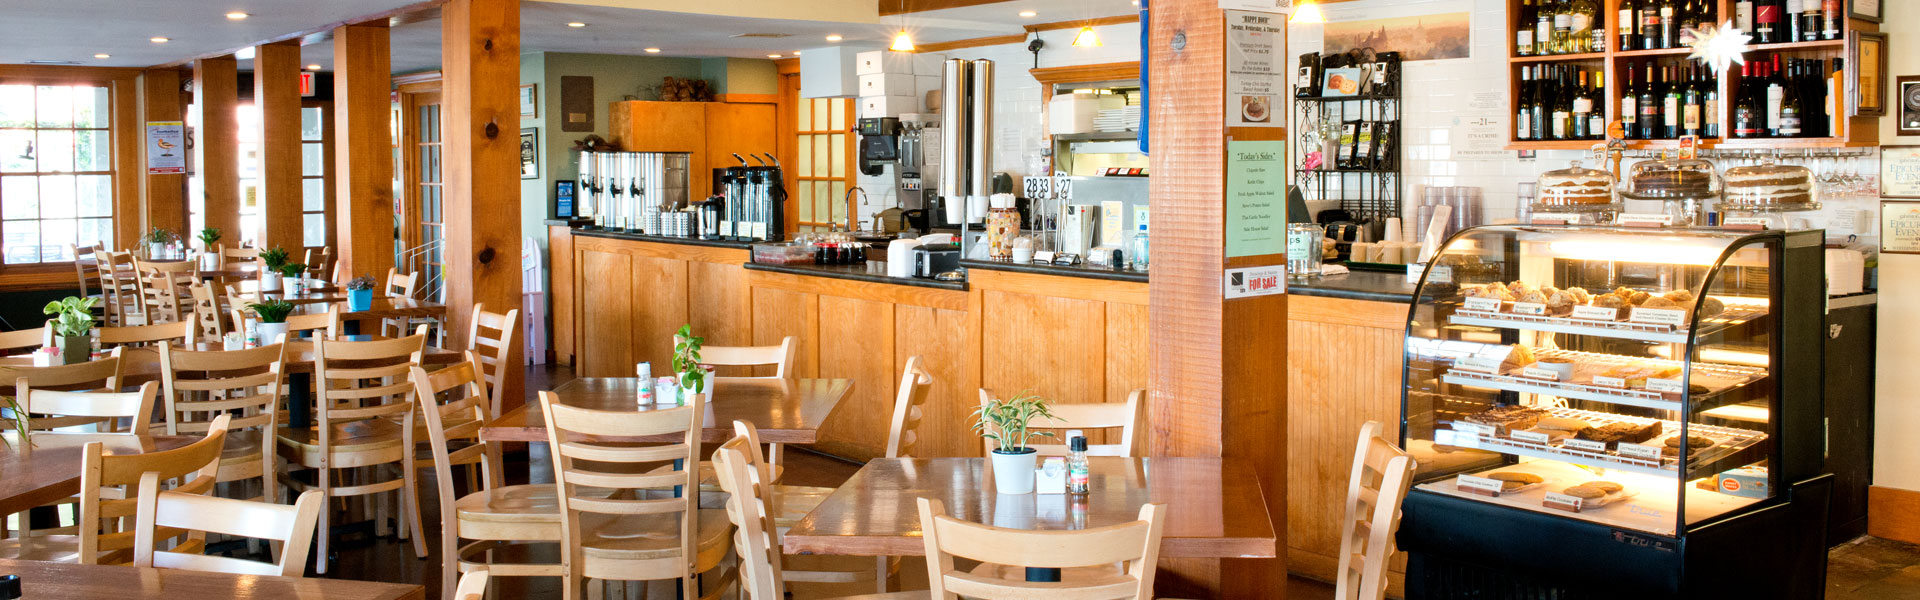 Mosquito Cafe, Galveston TX